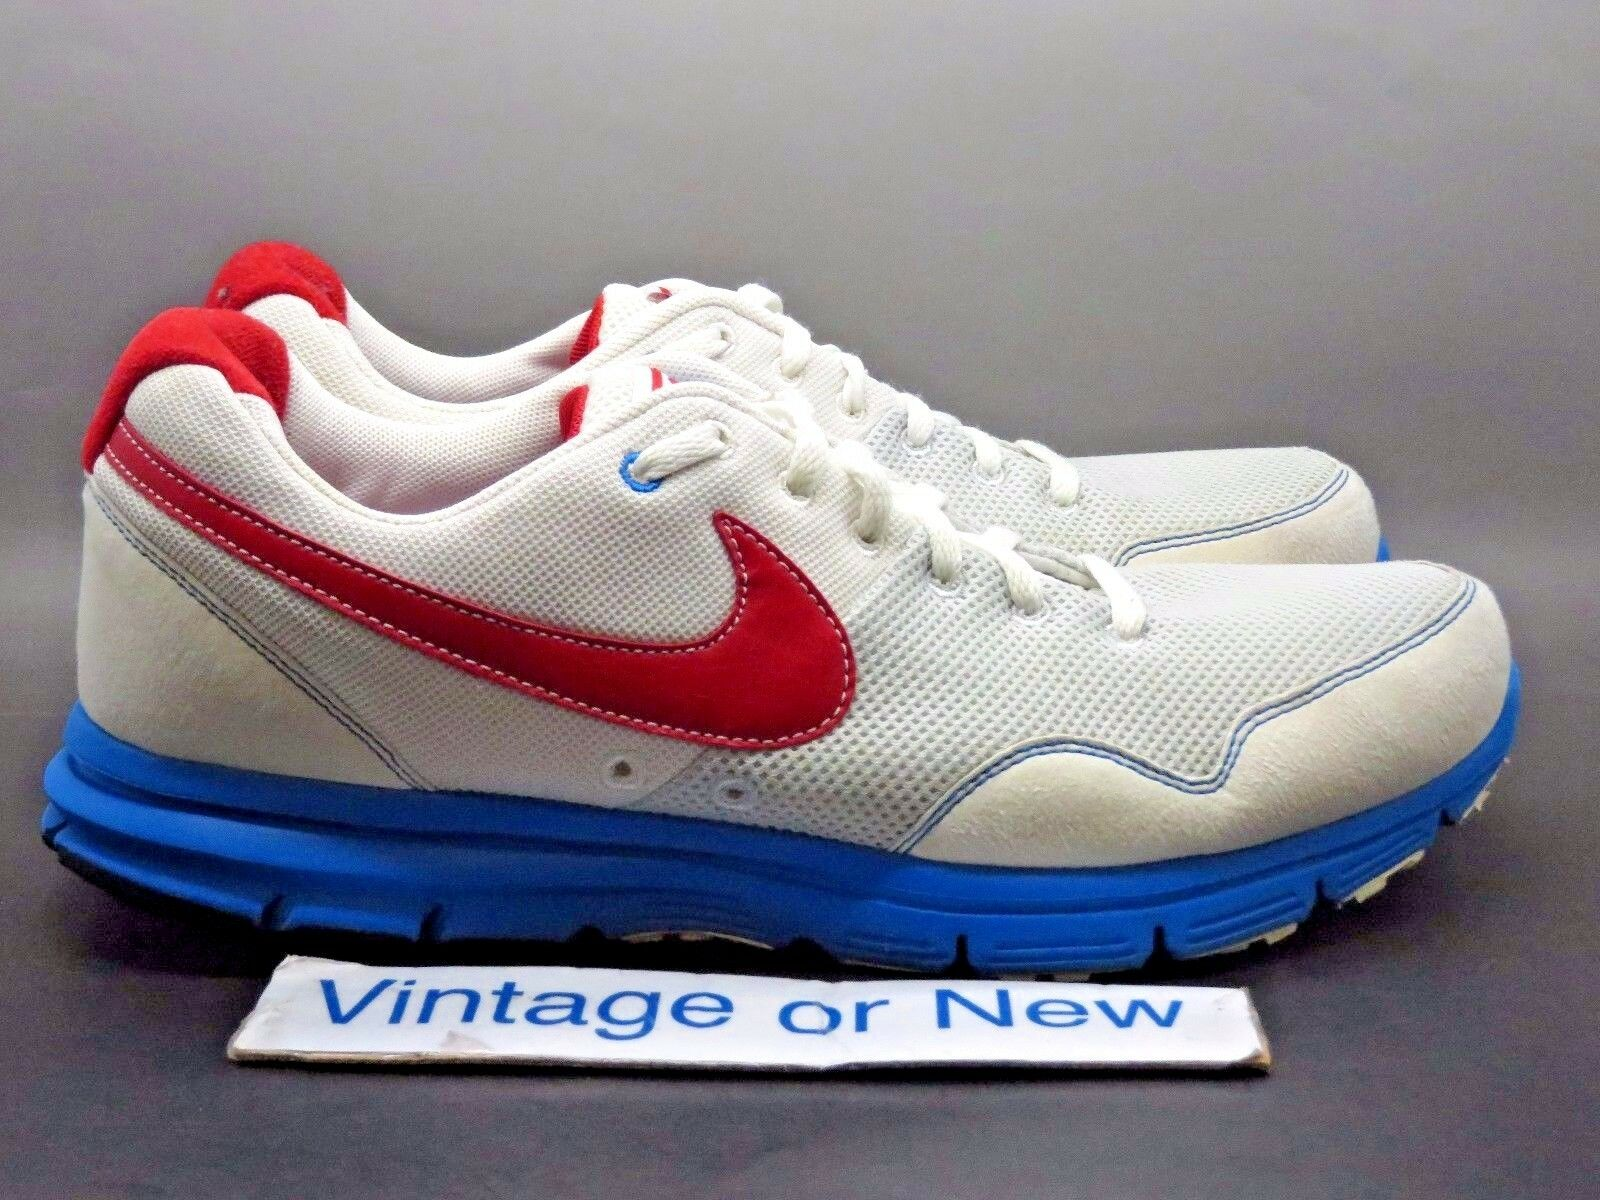 Sample Nike Lunarfly+ USA Track & Field White Sport Red Photo Blue 2018 sz 8.5